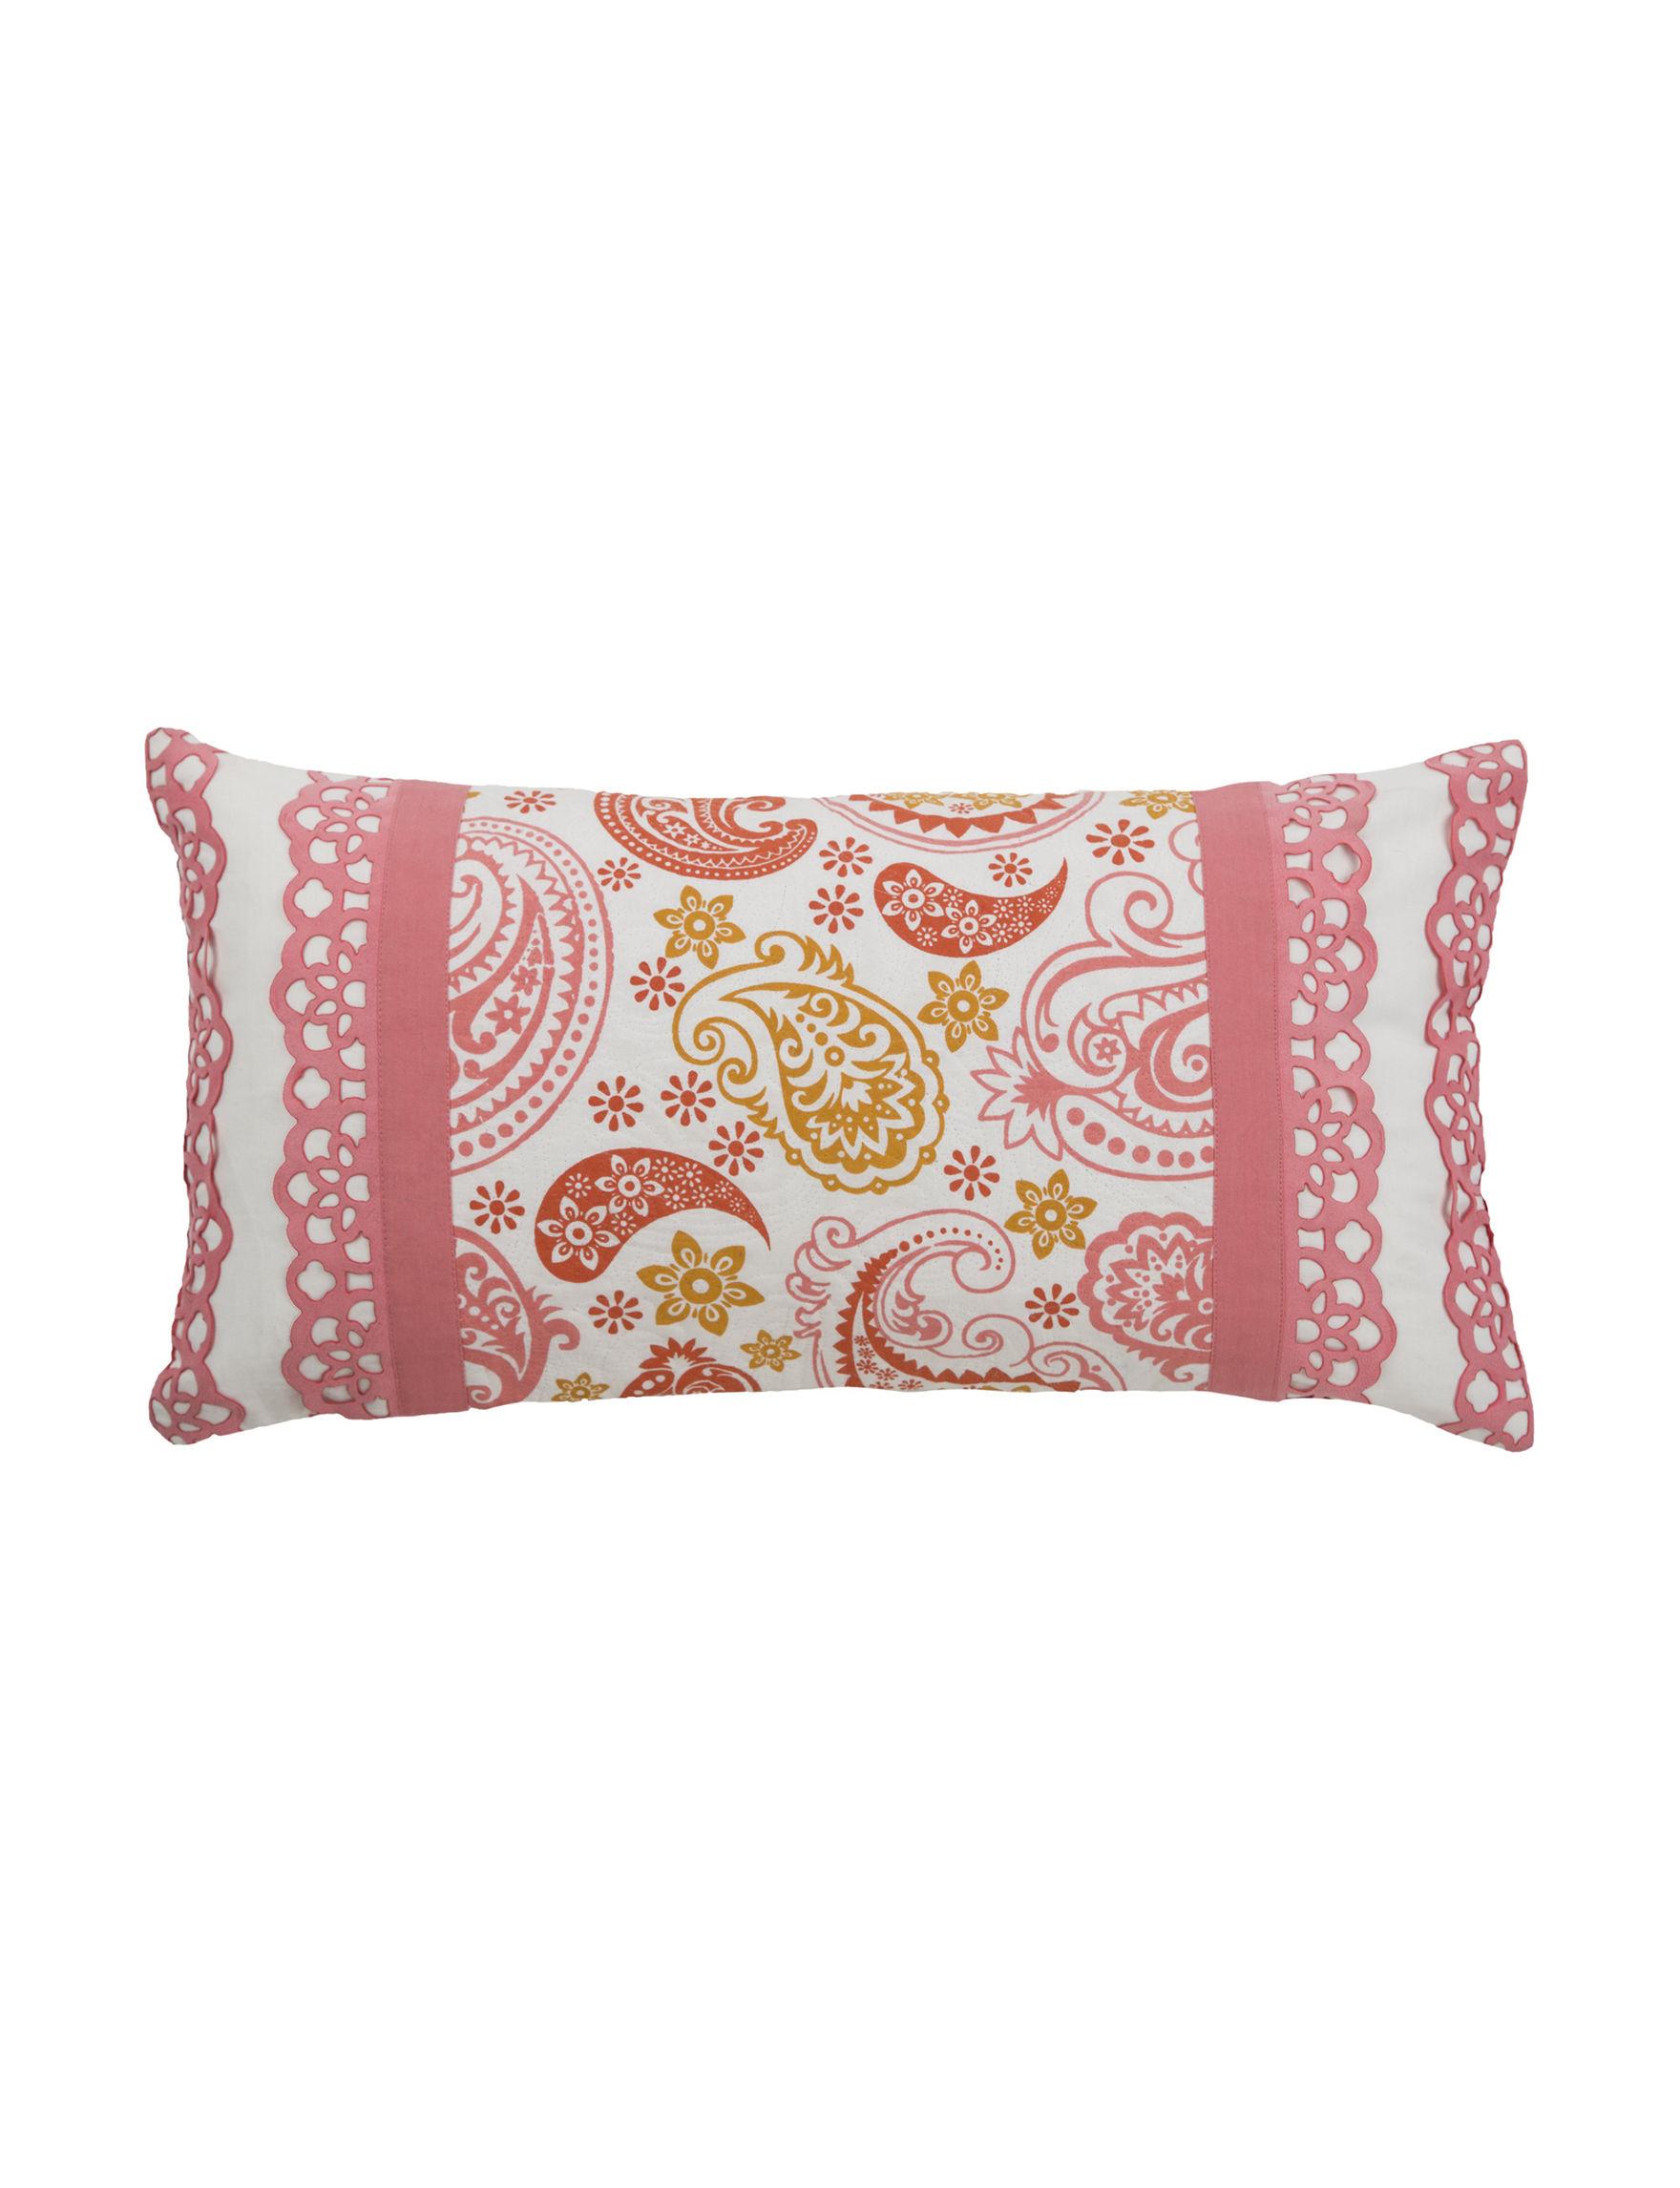 Rizzy Home Cream Decorative Pillows